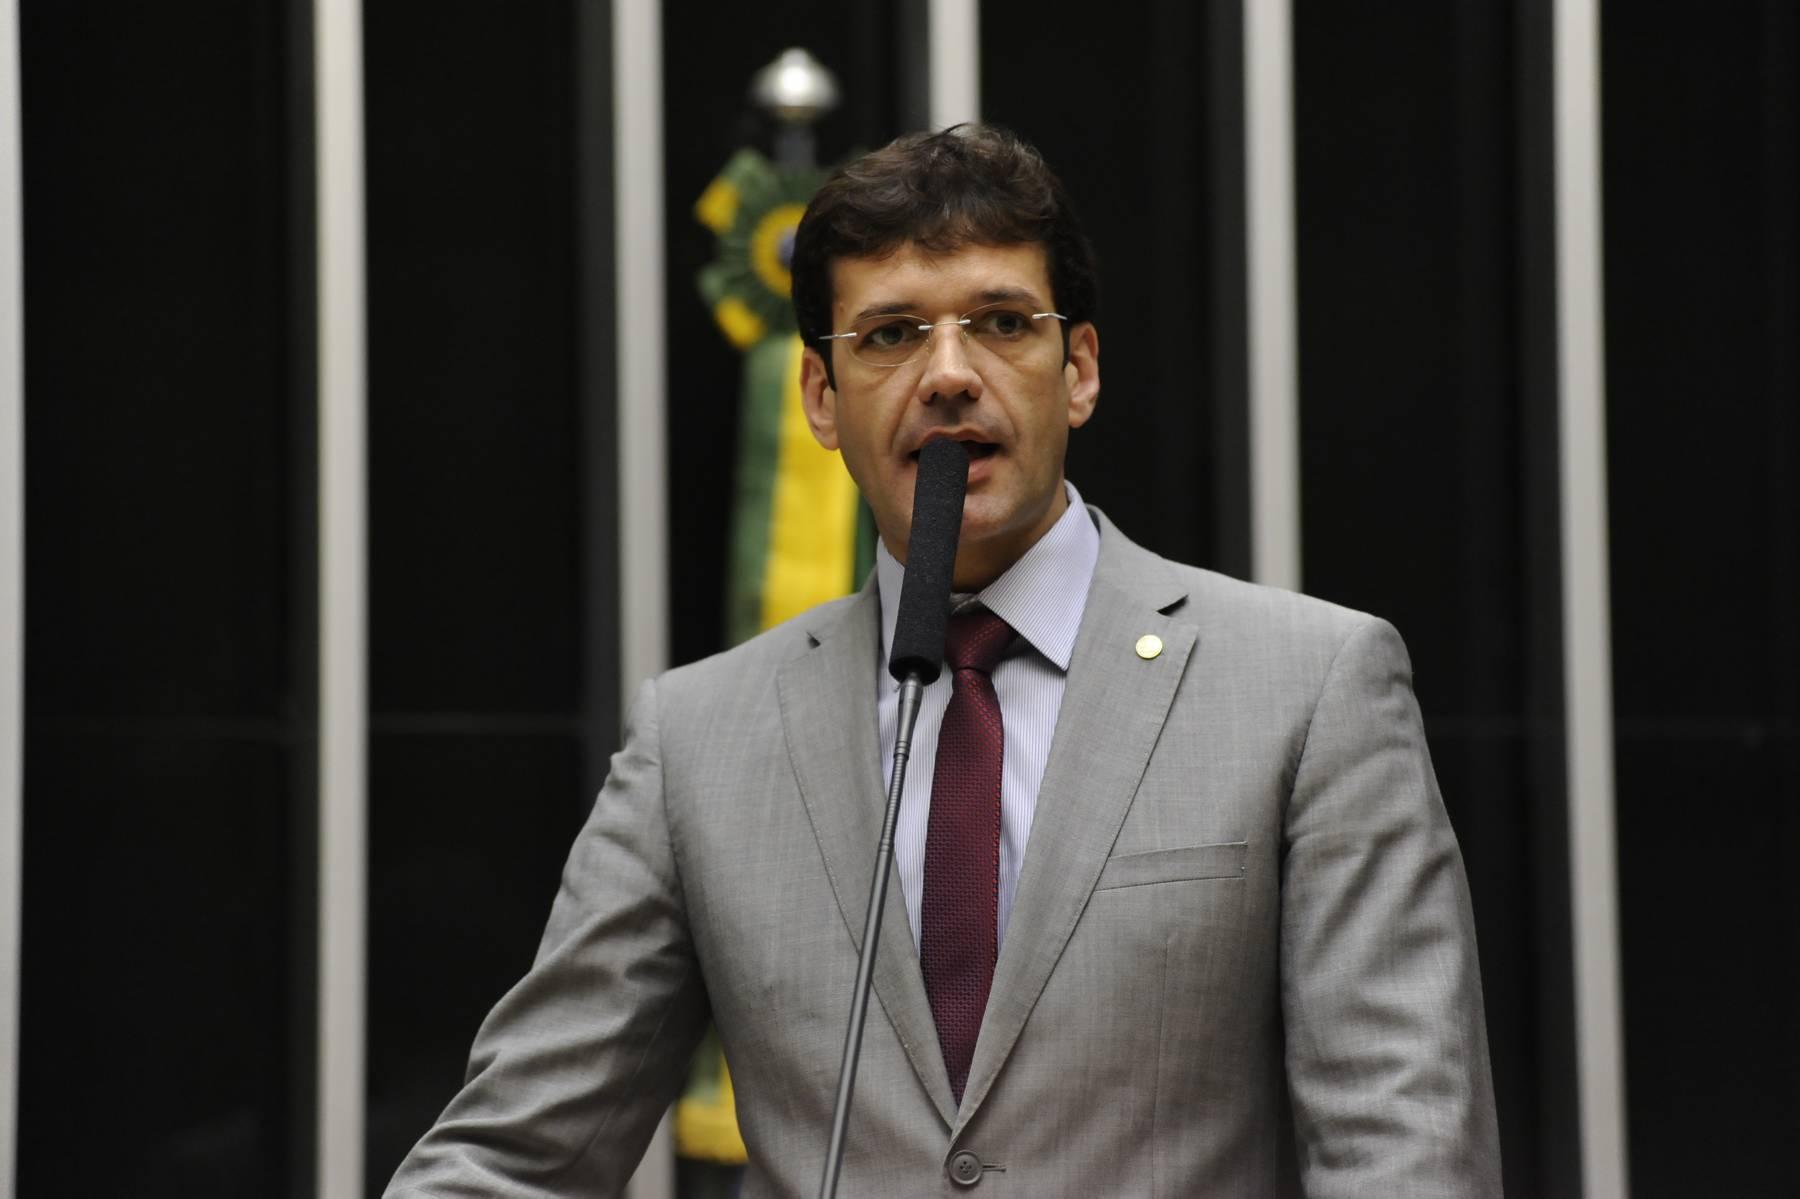 Deputados L - O - Marcelo Álvaro Antônio